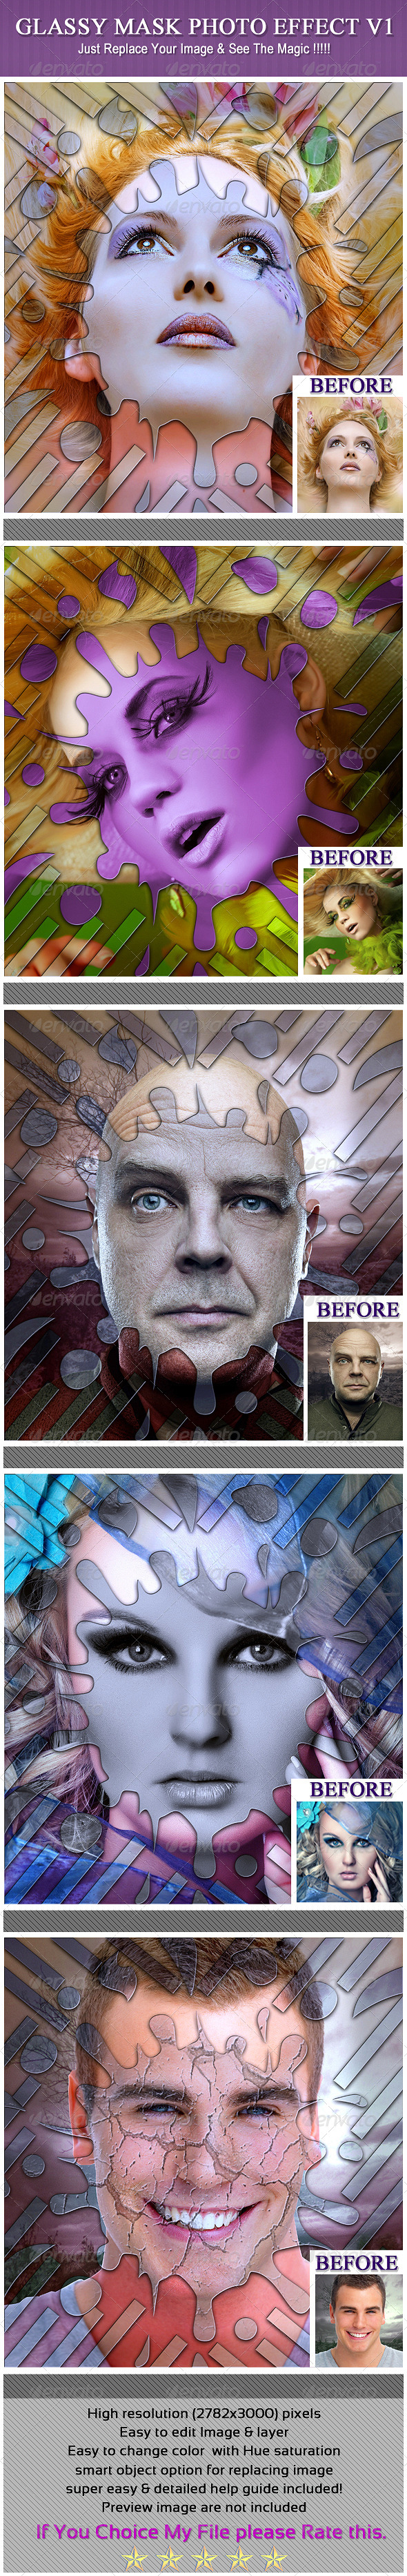 GraphicRiver Glassy Mask Photo Effect V1 6210858